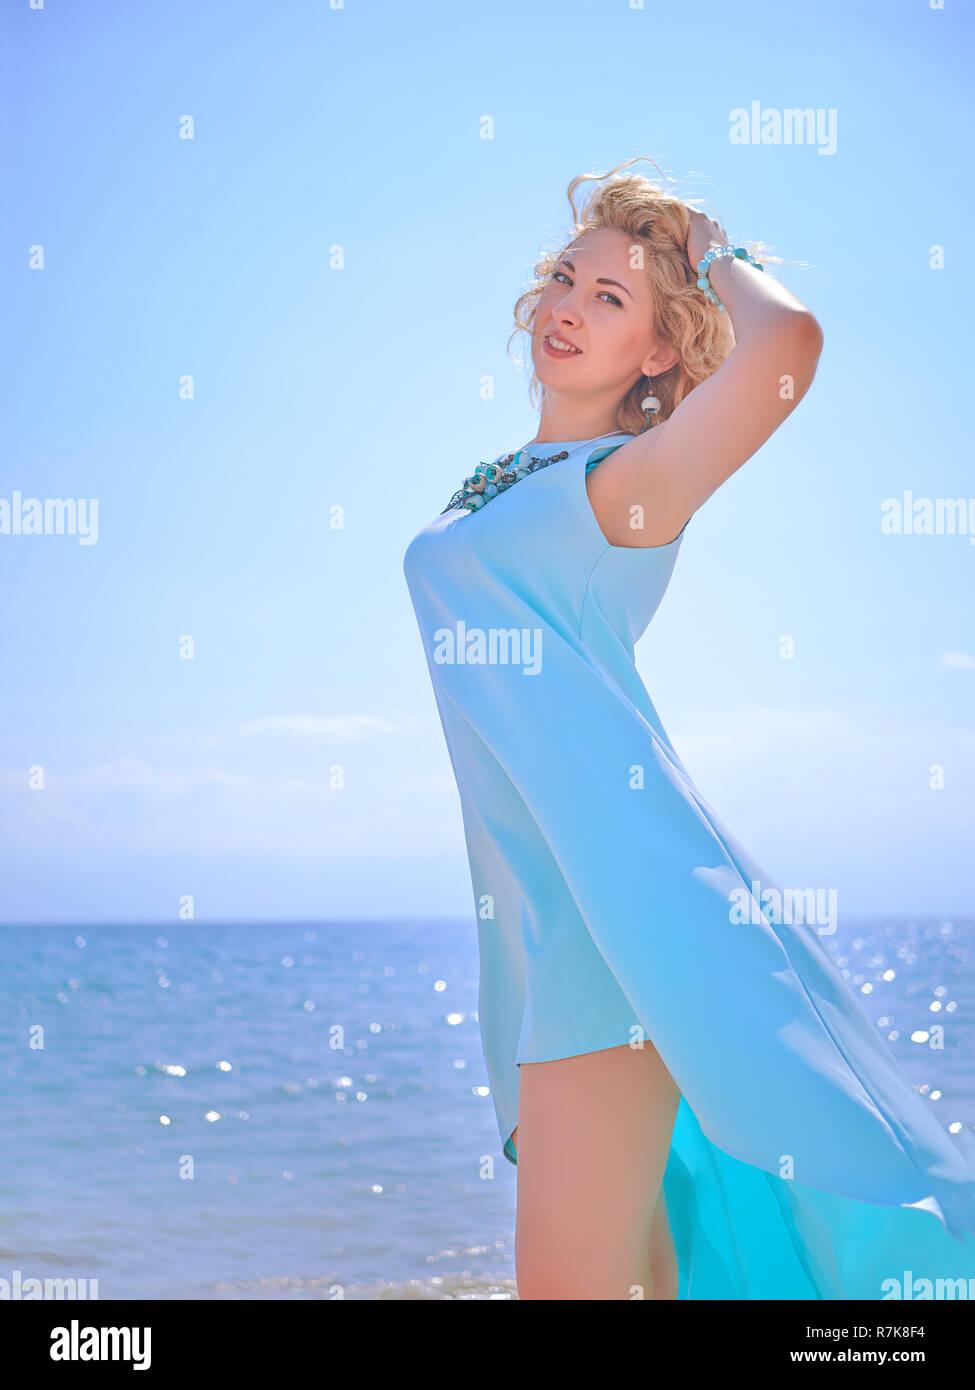 Stunning blondy woman in cyan dress on the beach - Stock Image